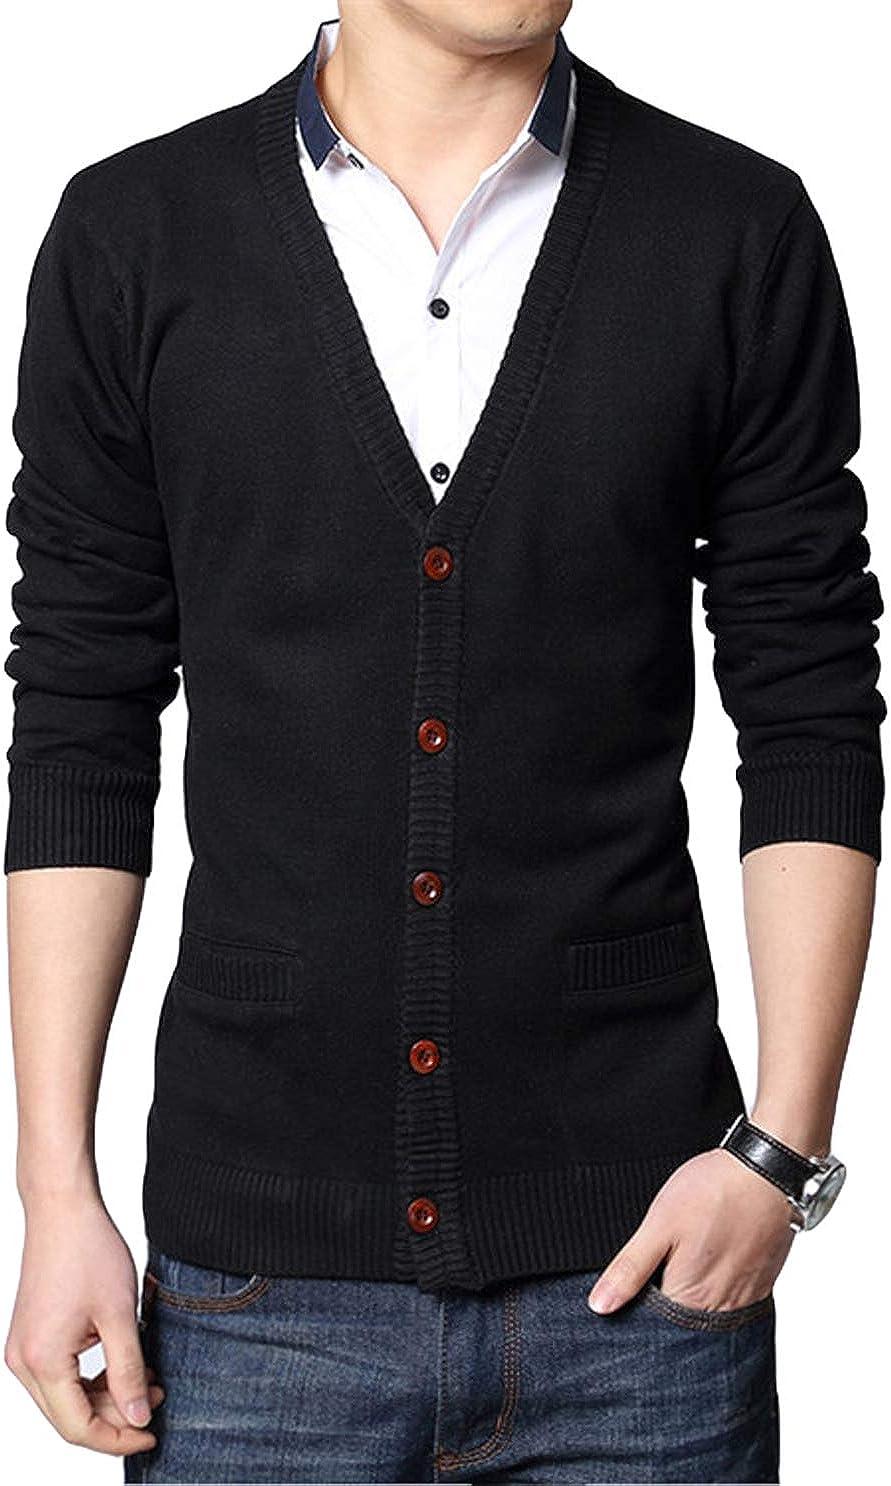 Itemnew Men's Essential V-Neck Single Breasted Regular Lightweight Knitwear Cardigan Sweater